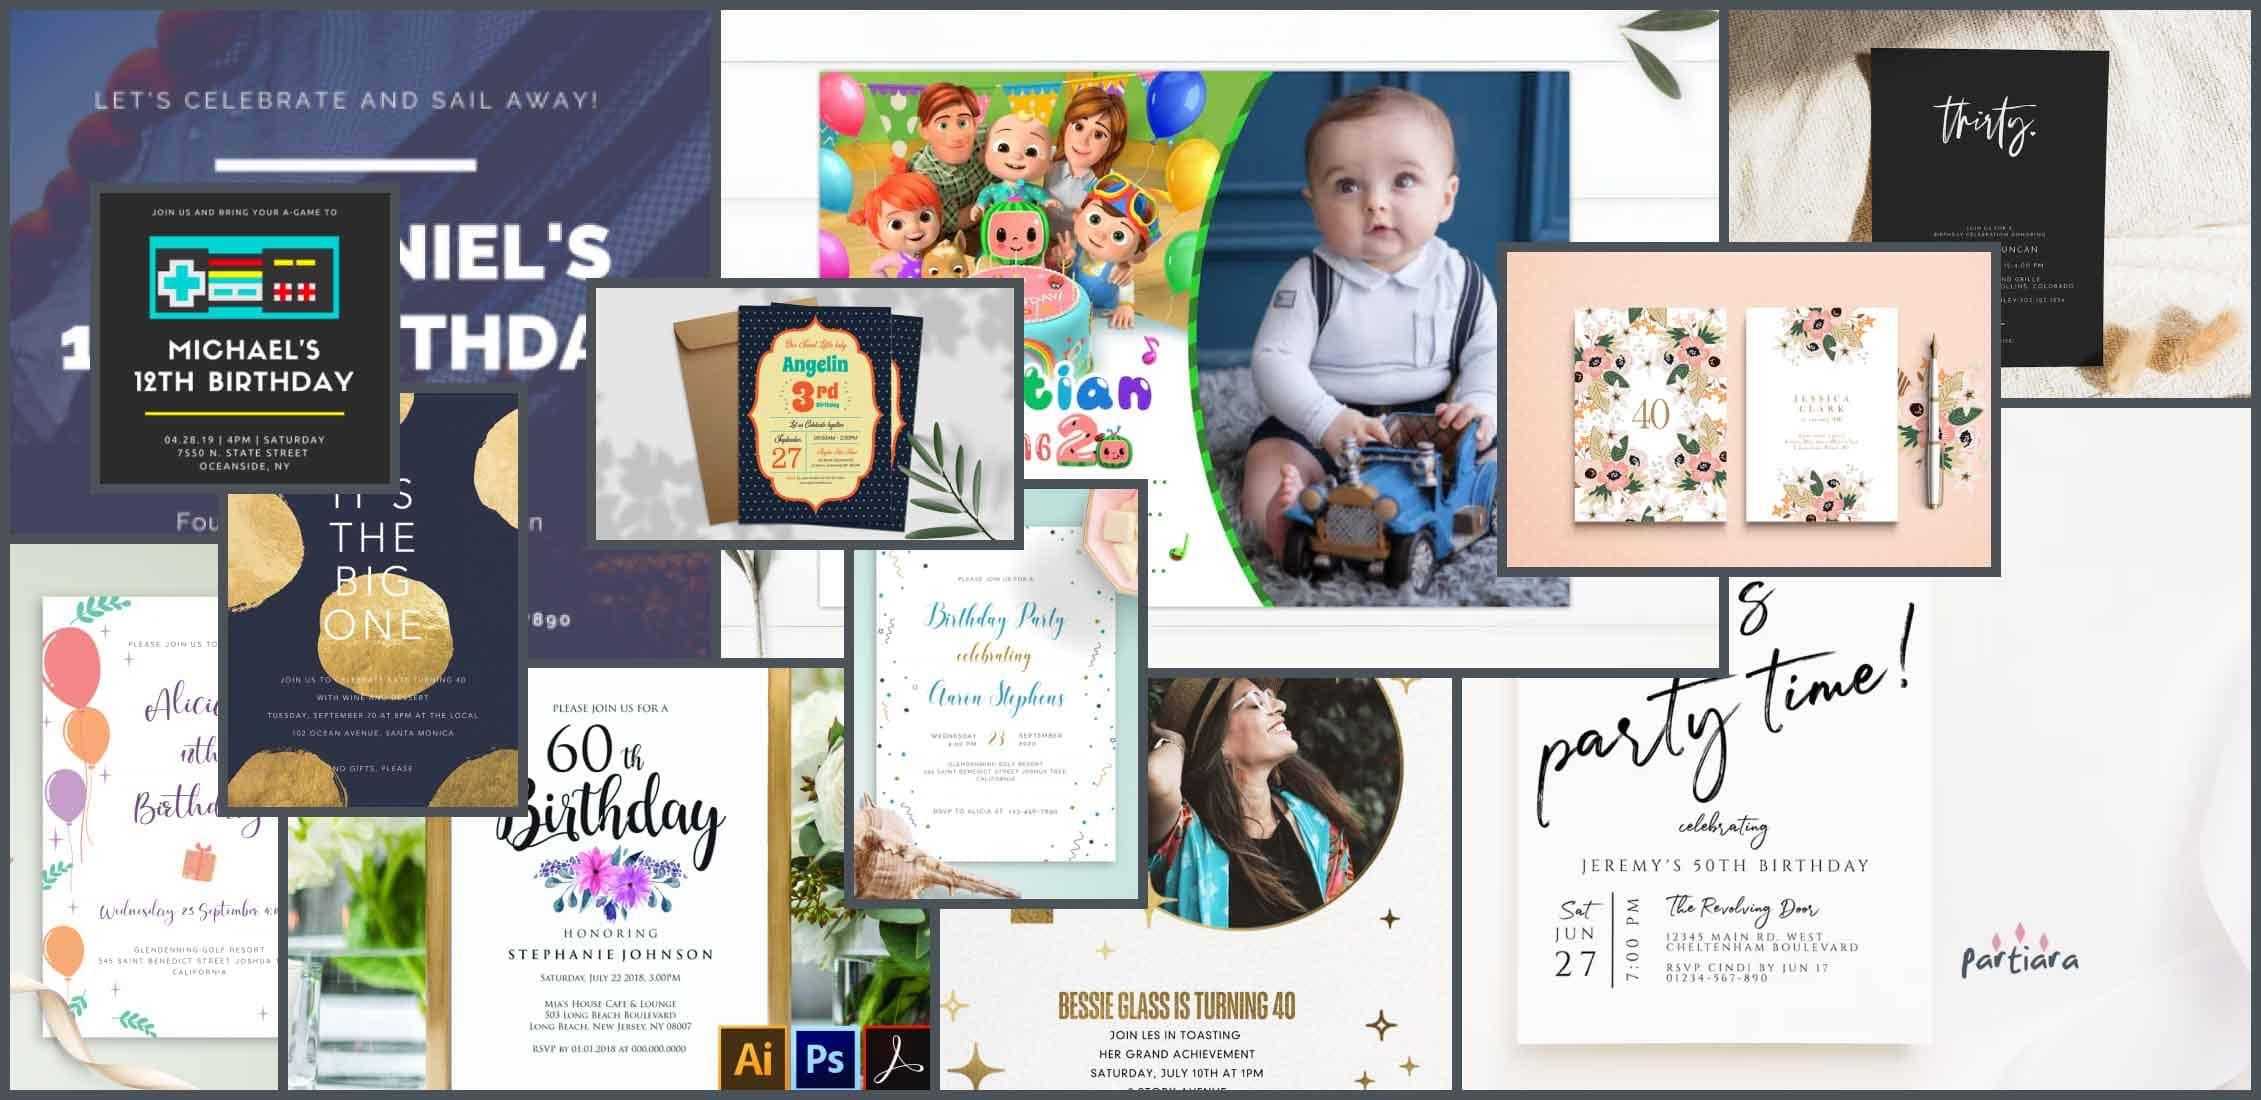 birthday invitation templates Example.